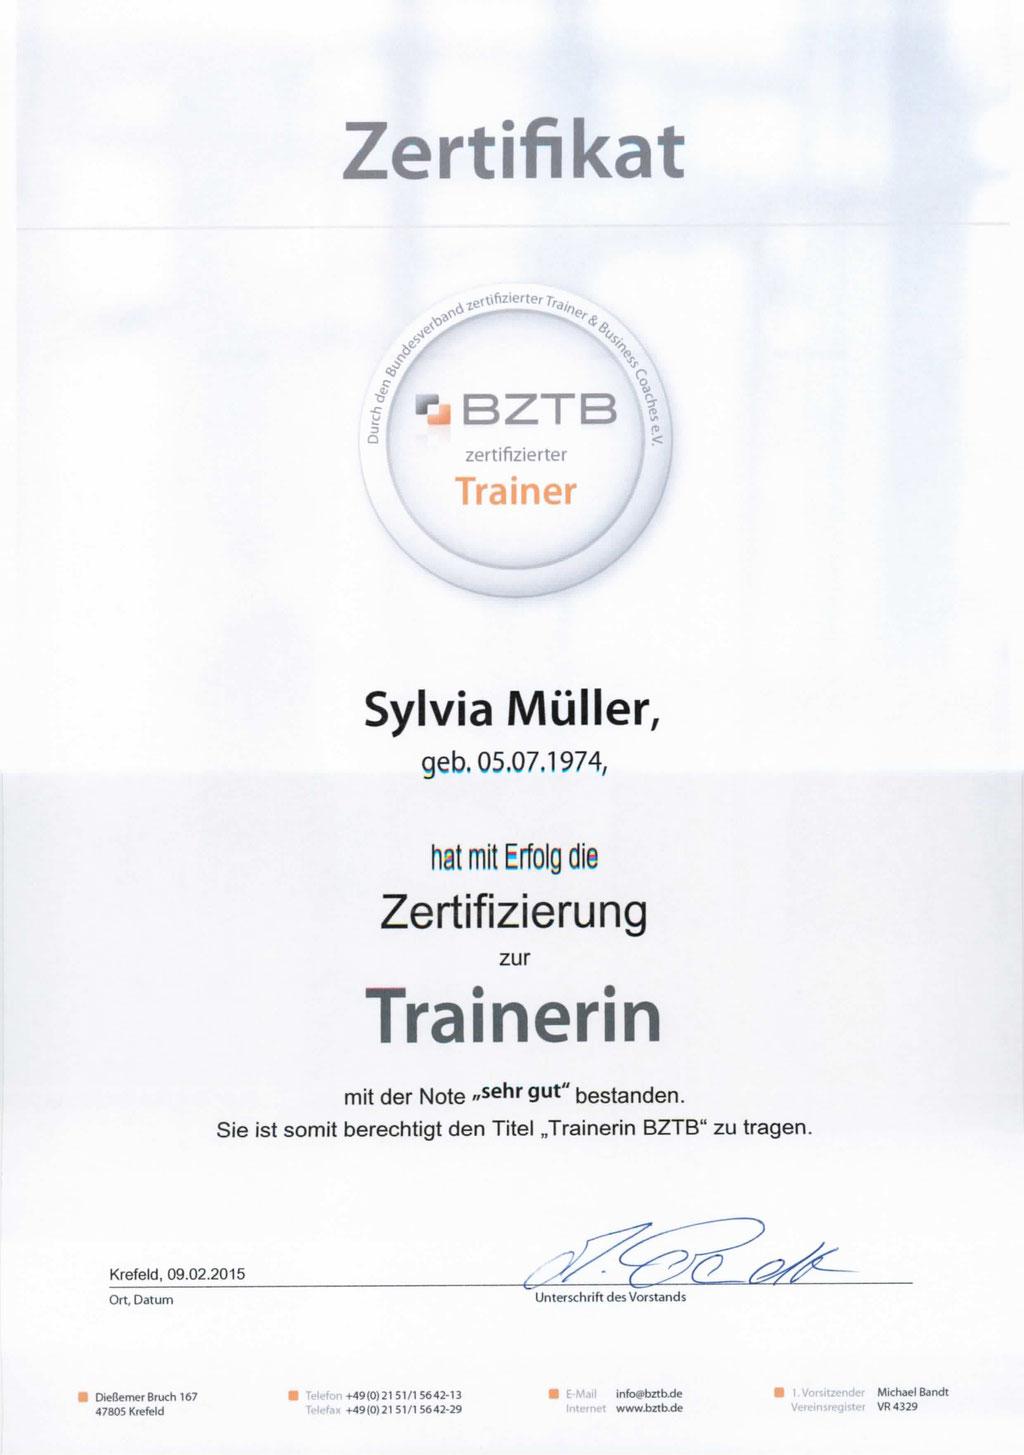 Trainerzertifikat BZTB